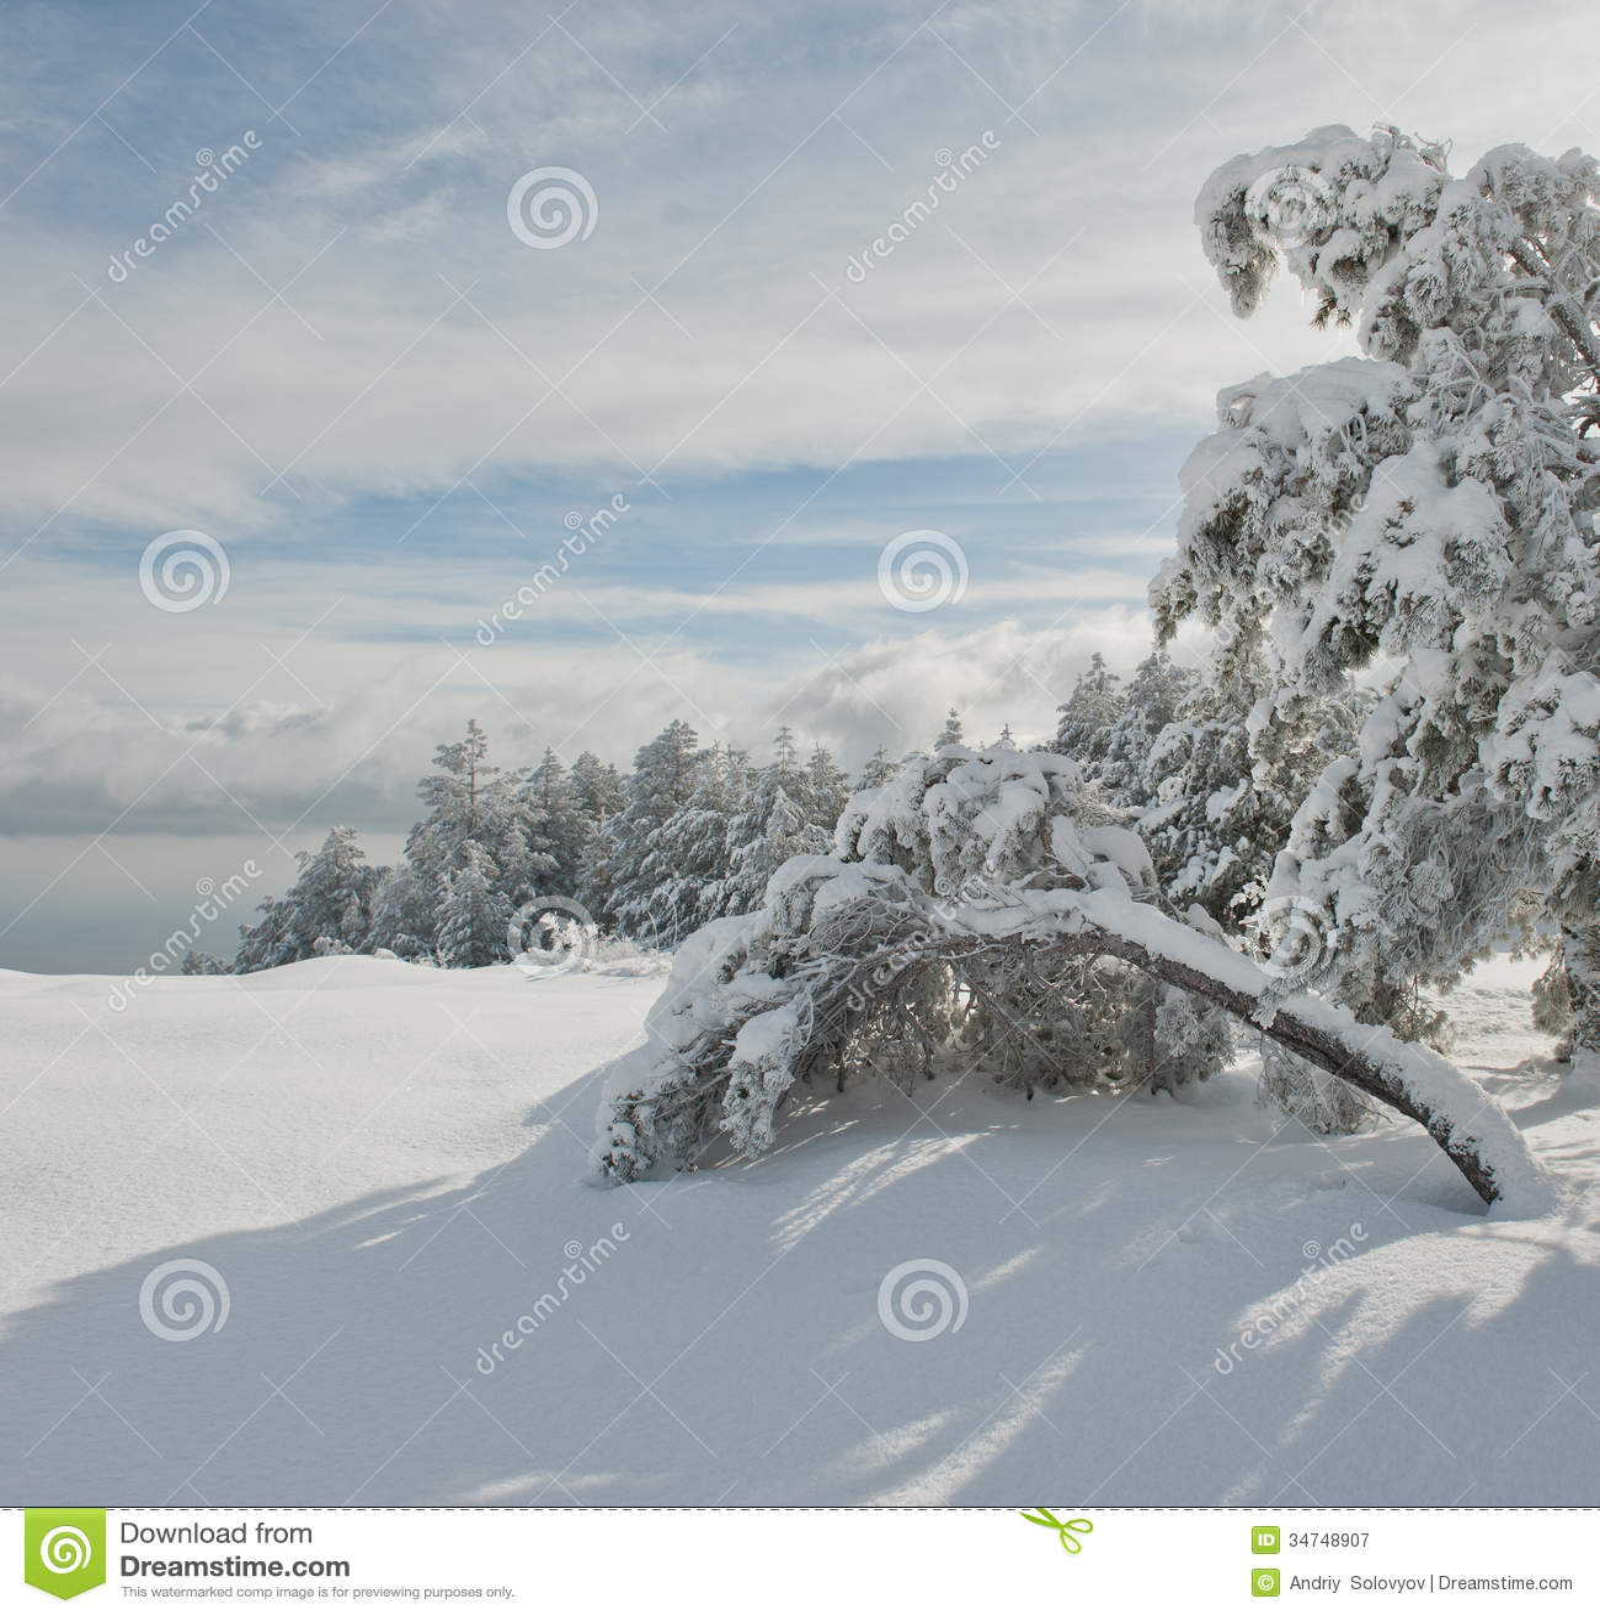 sunny winter day no snow